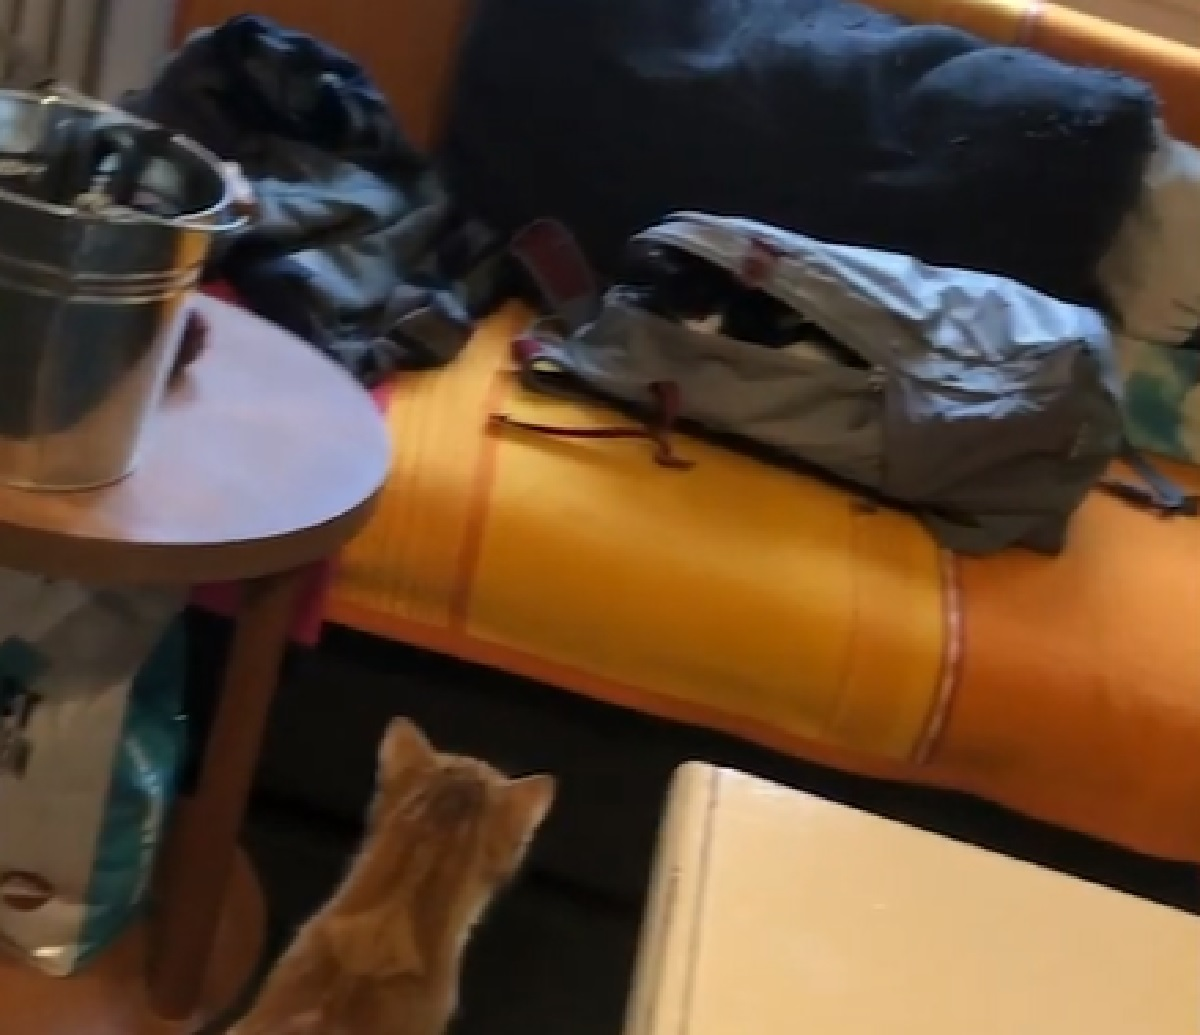 findus pattersson fratelli gatti